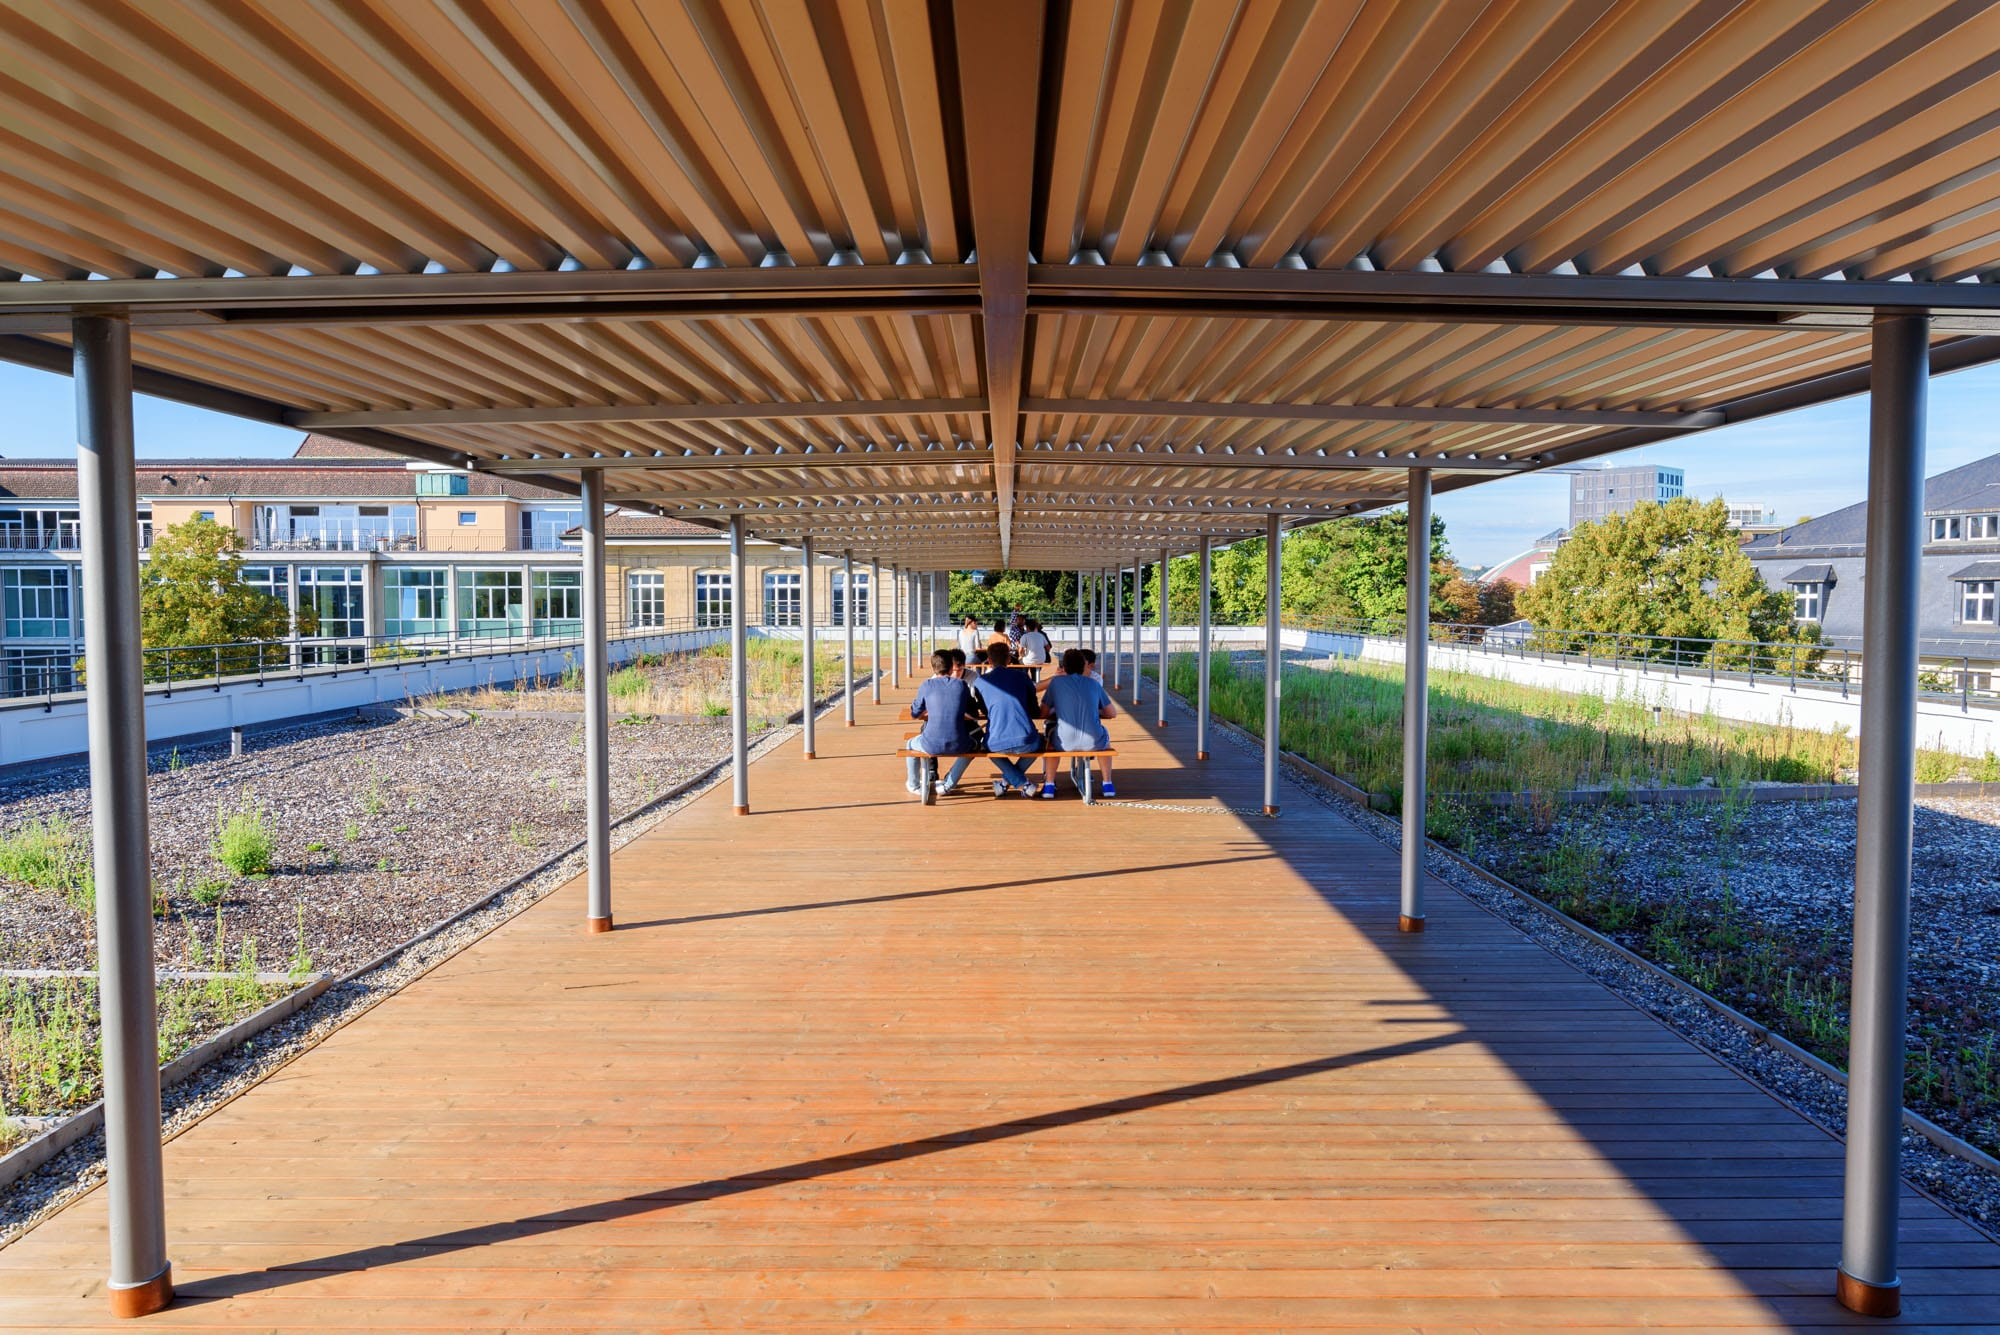 Stahlbau Basel – Pergola